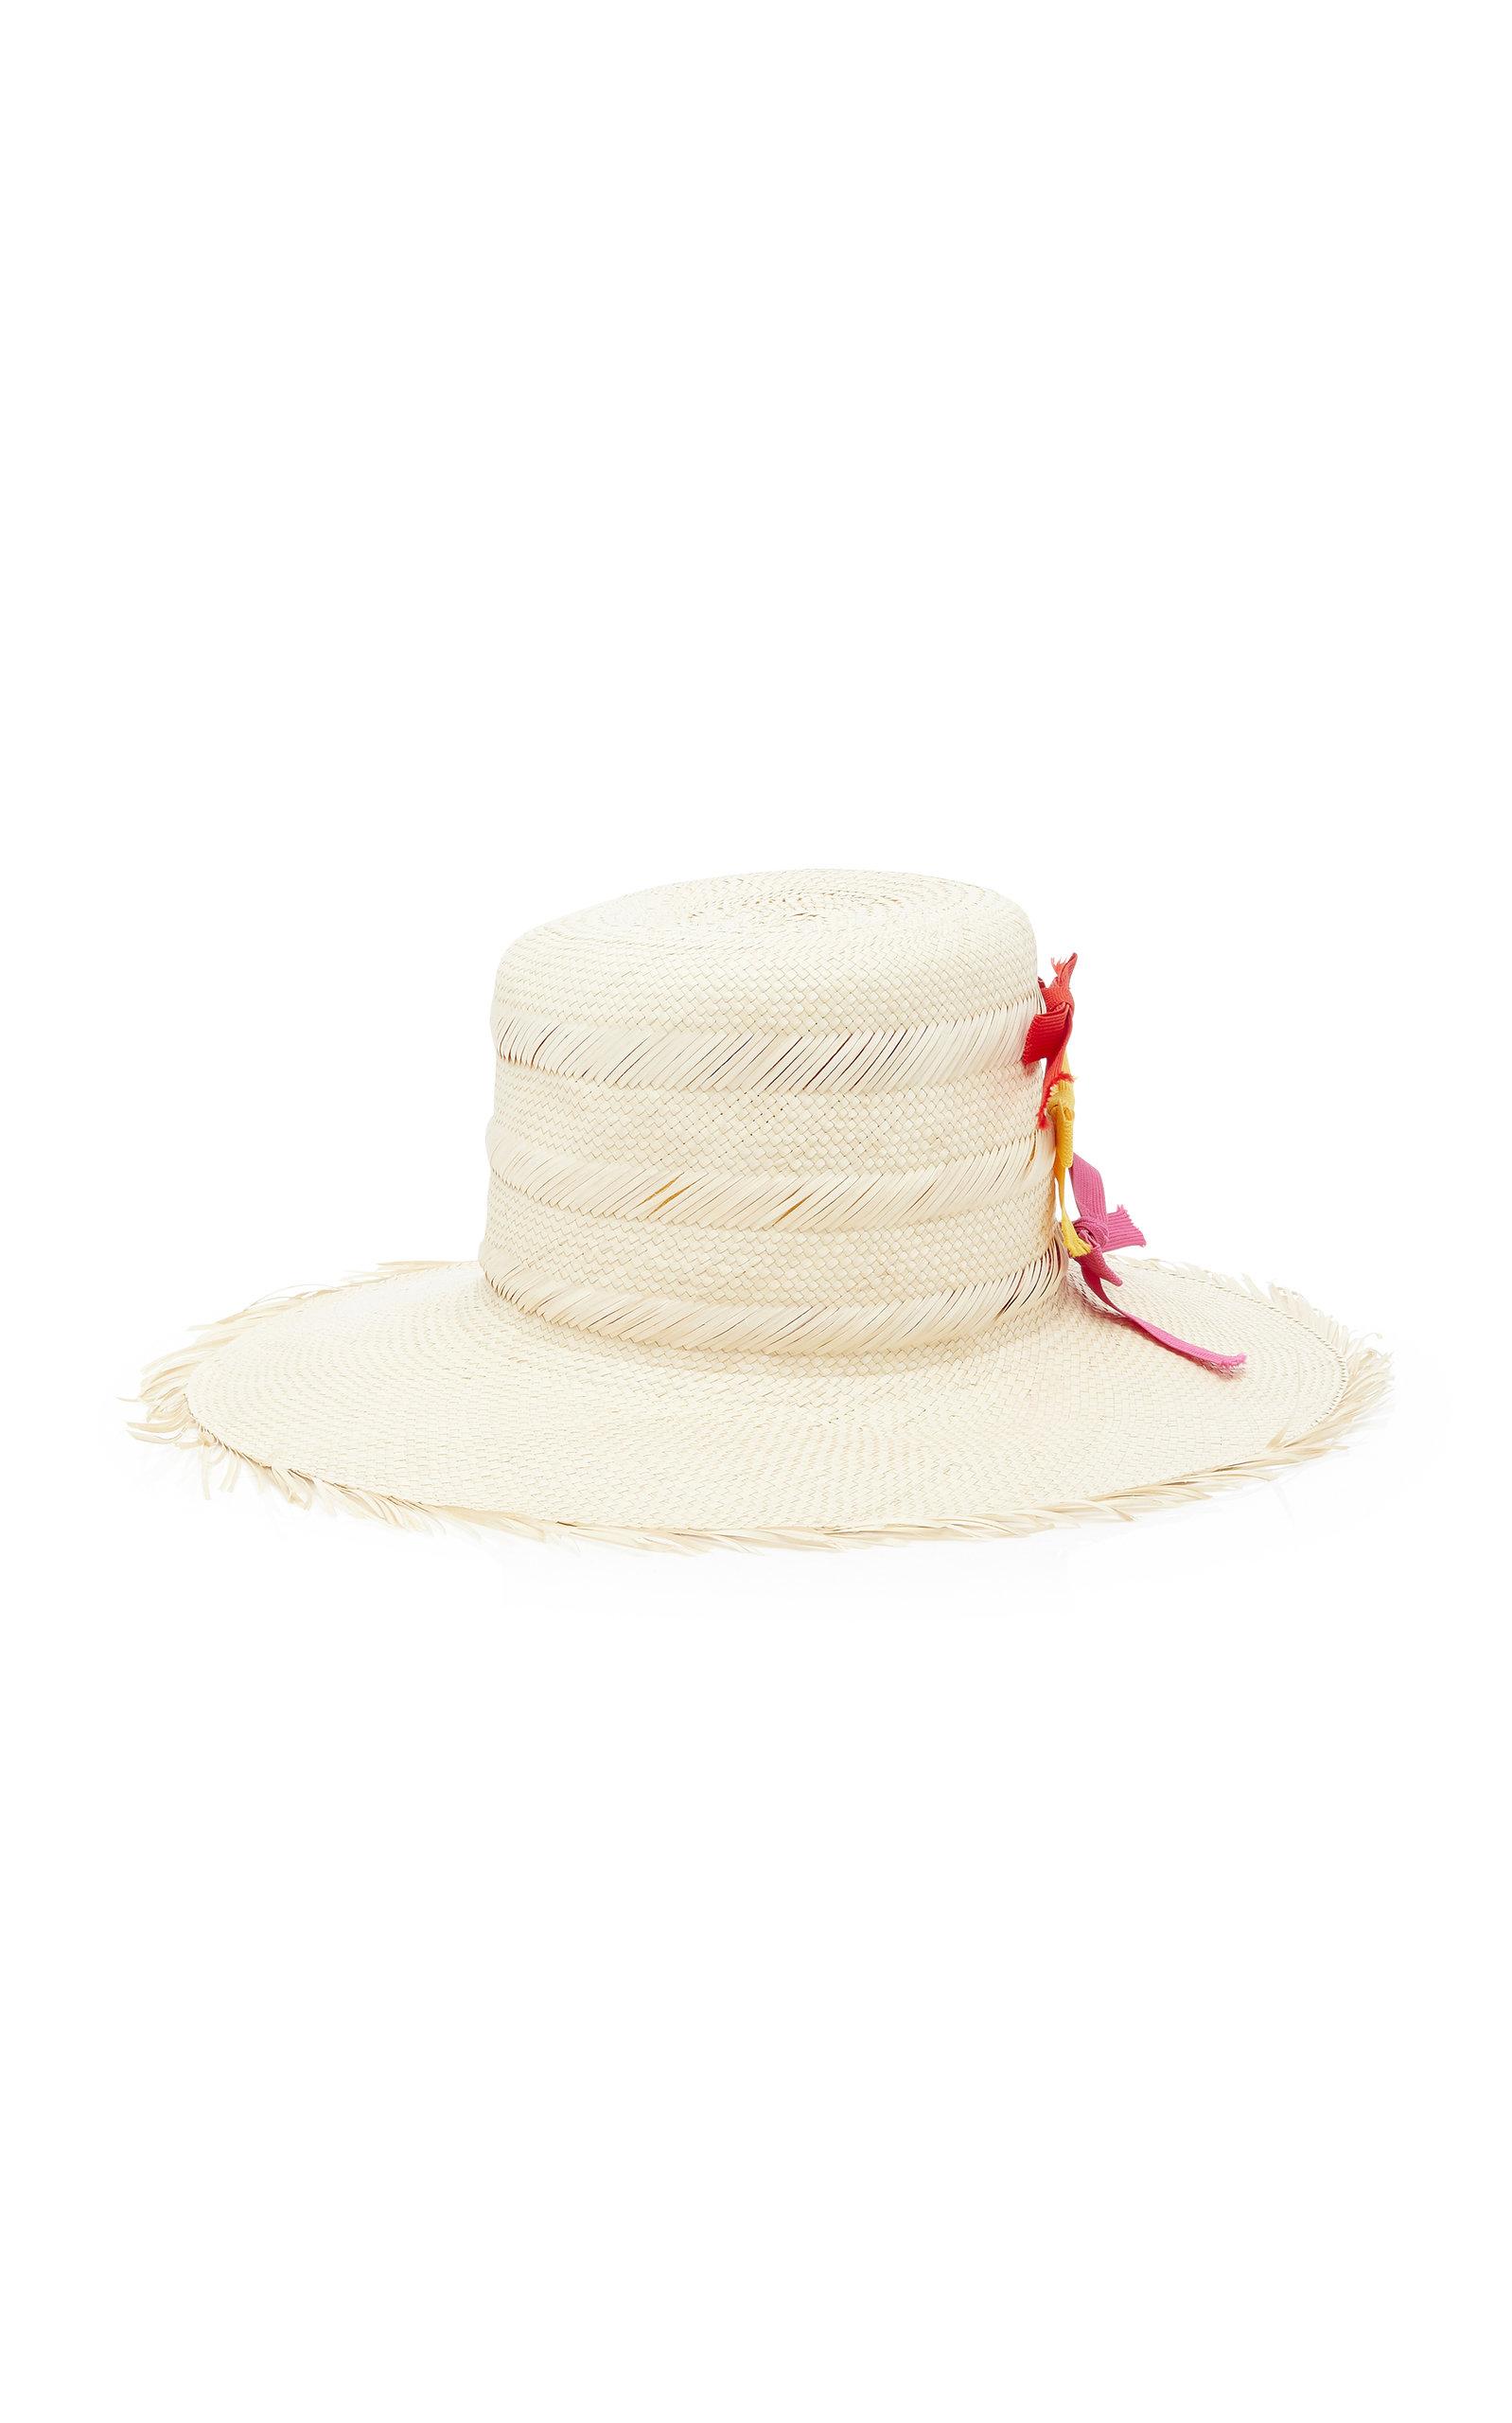 YESTADT MILLINERY Trois Bow Straw Hat in Neutral